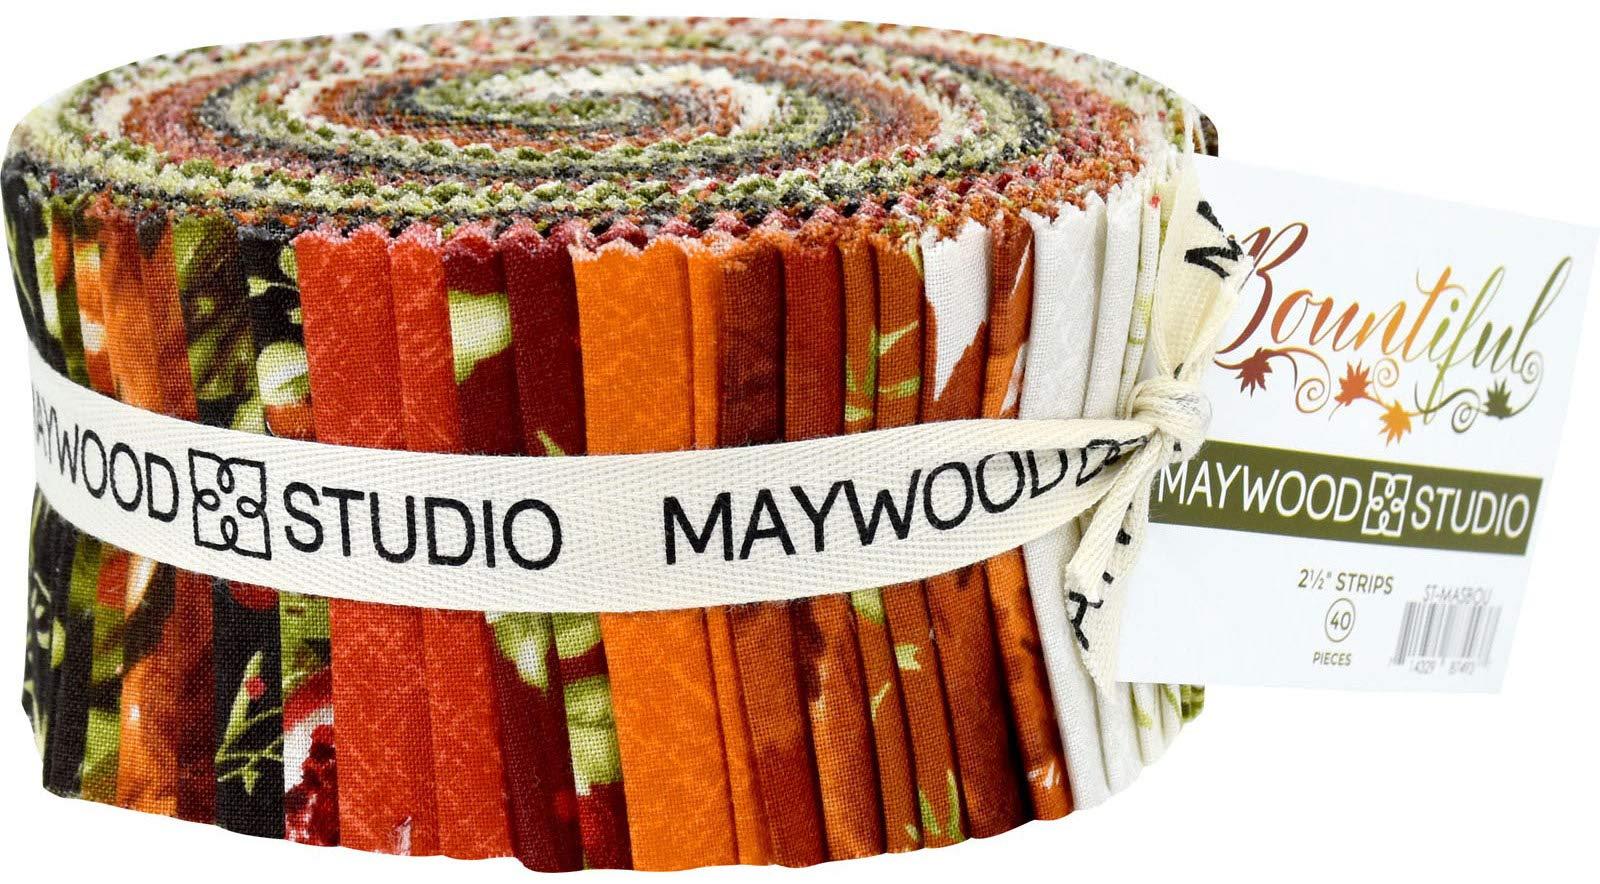 Bountiful Jelly Roll 40 2.5-inch Strips by Maywood Studio by Maywood Studio